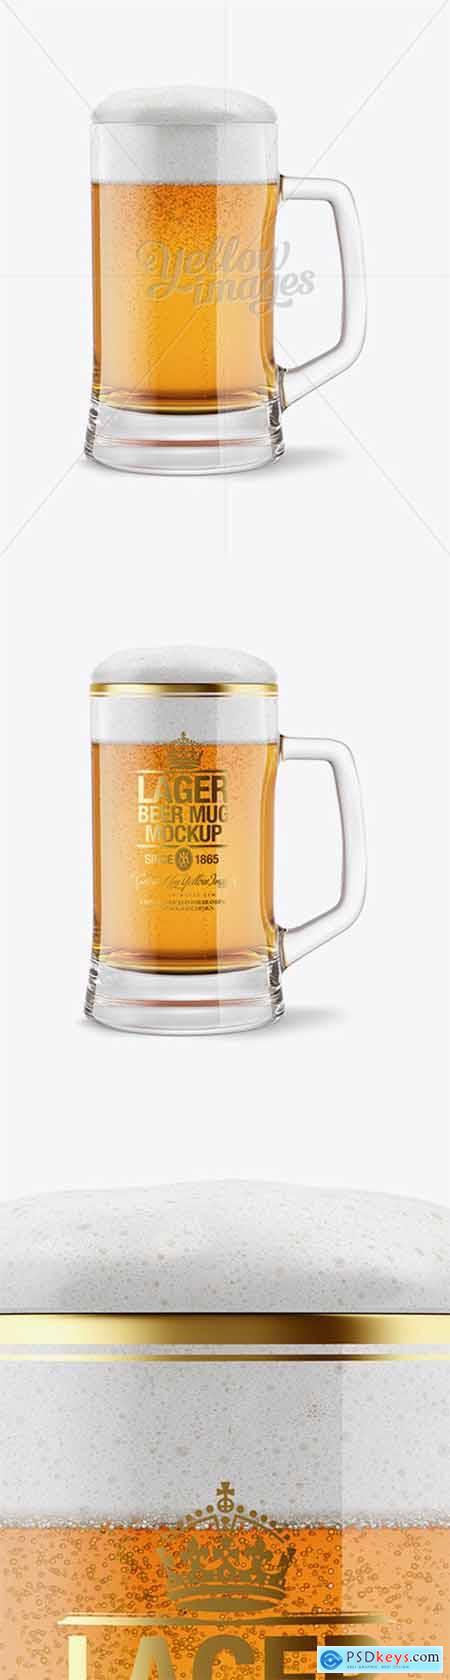 Tankard Glass Mug with Lager Beer Mockup 14664